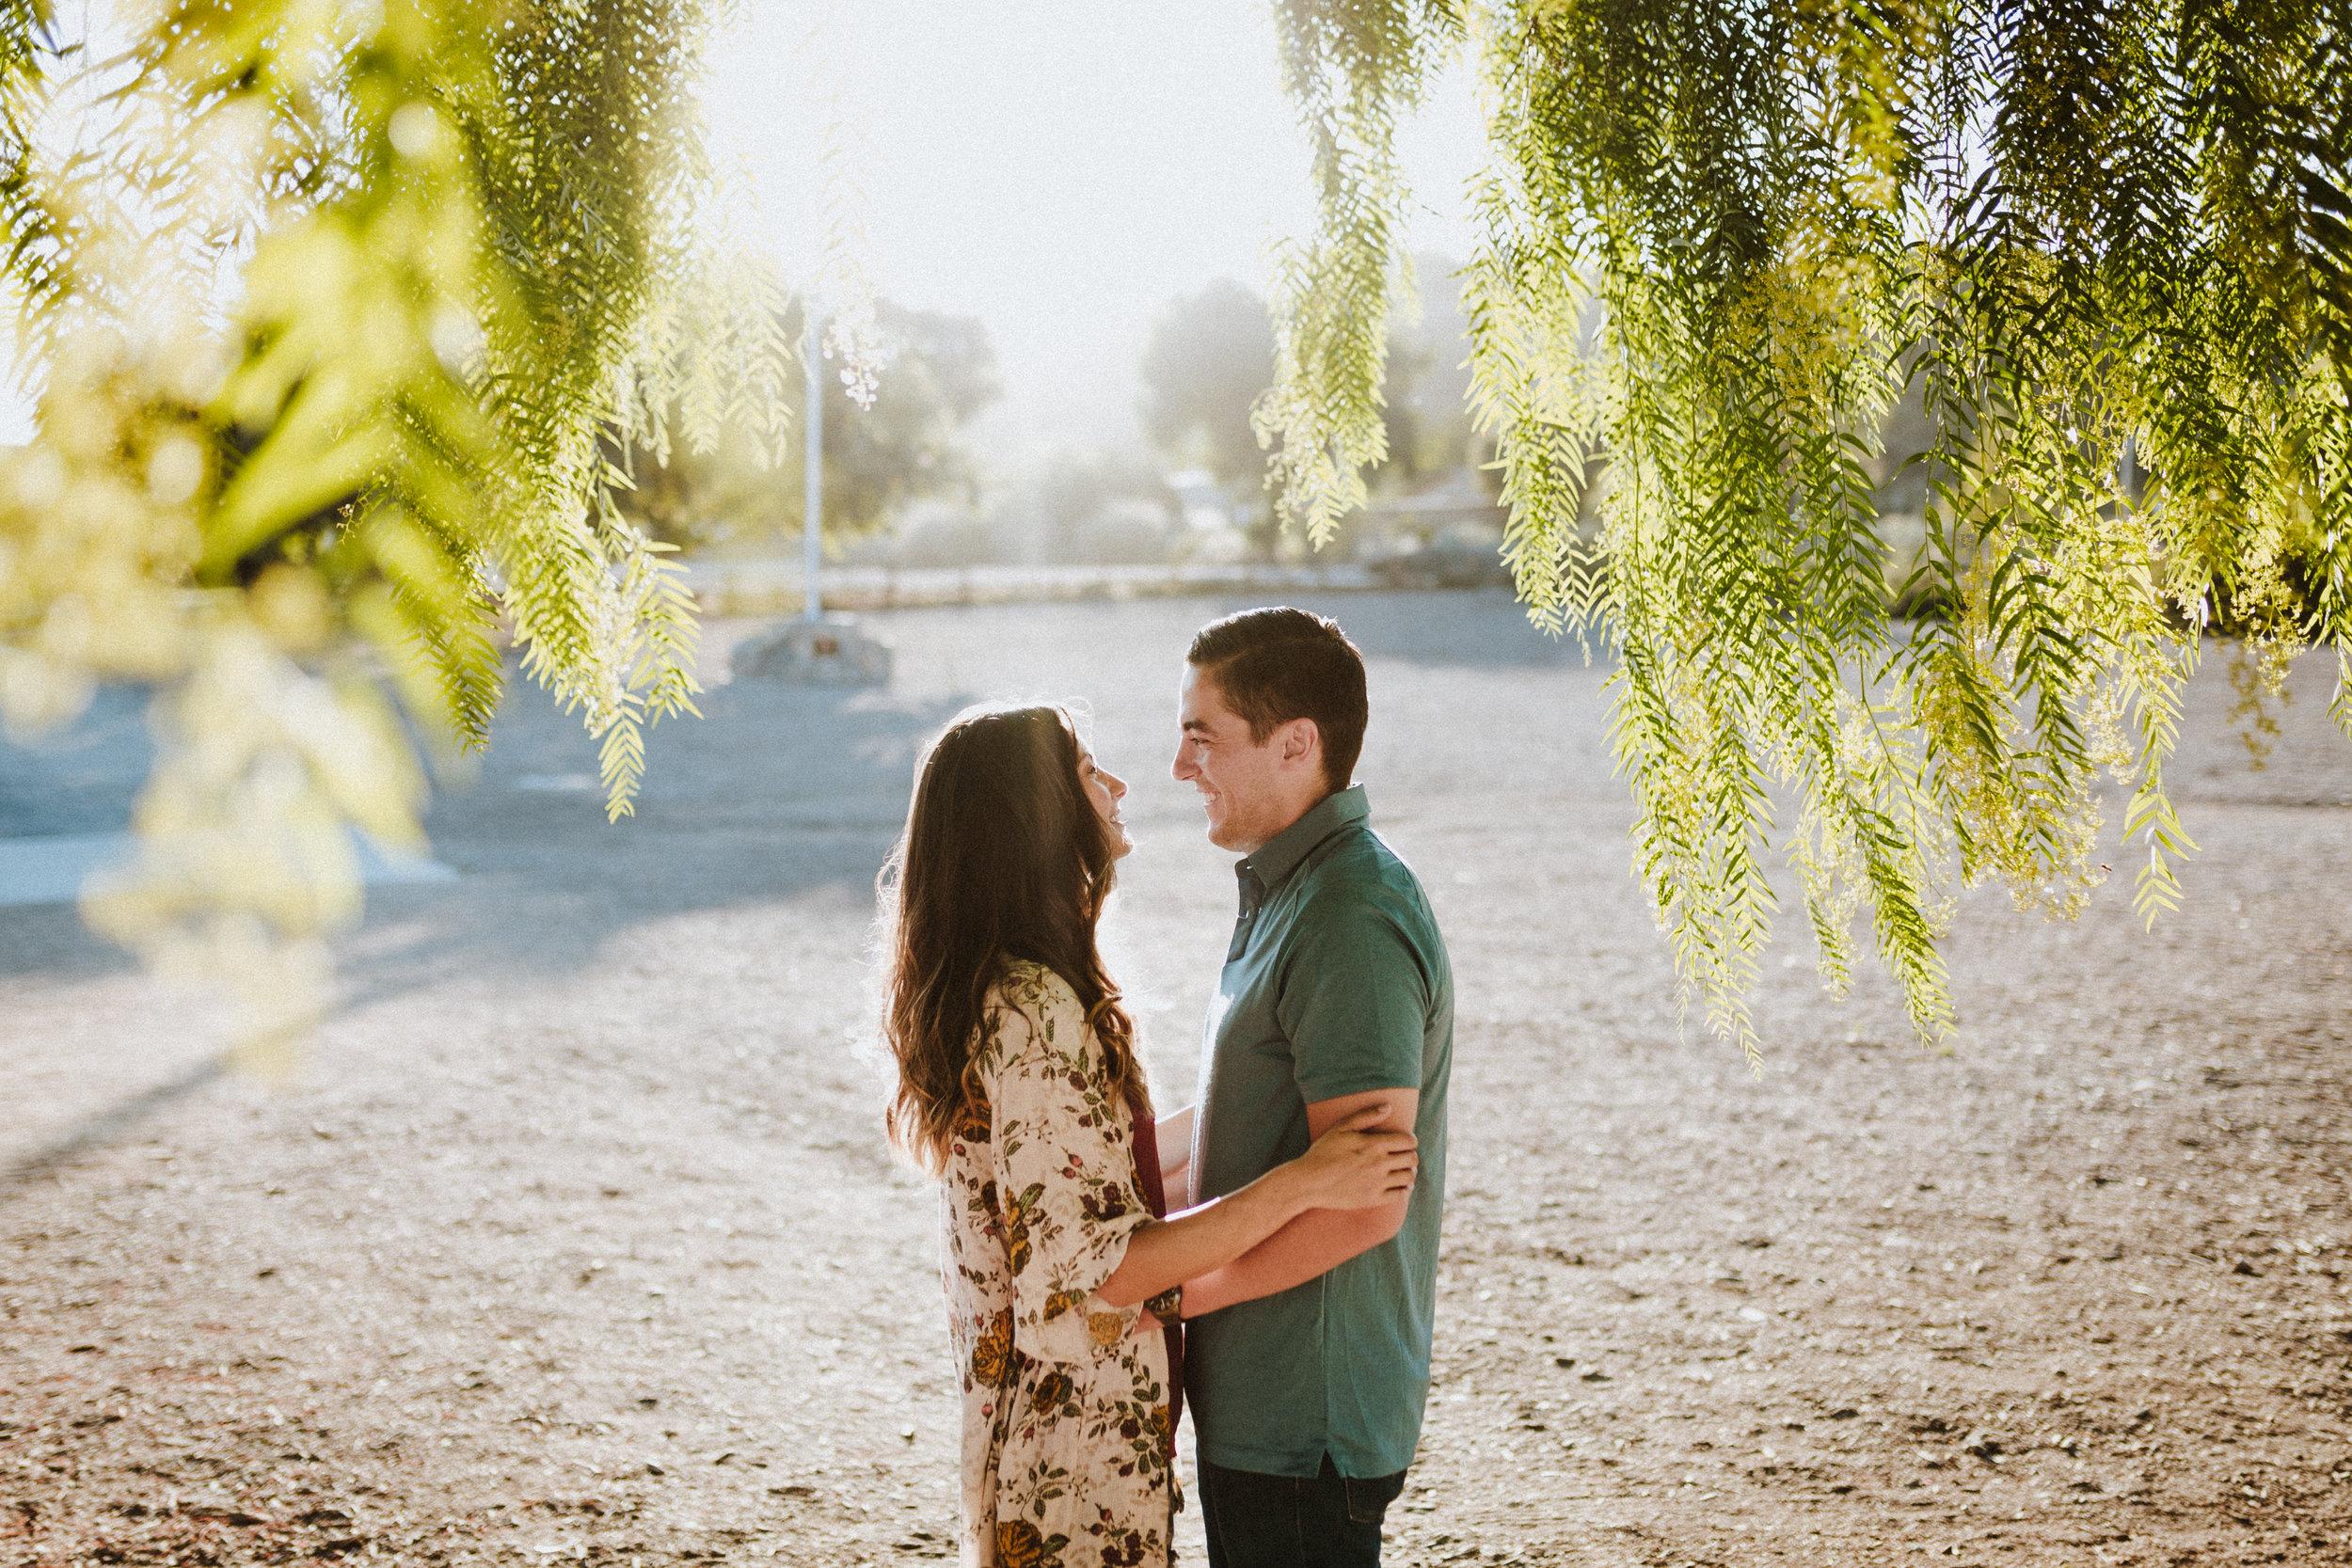 Shandra_Kasey_Engagement-25-2.jpg